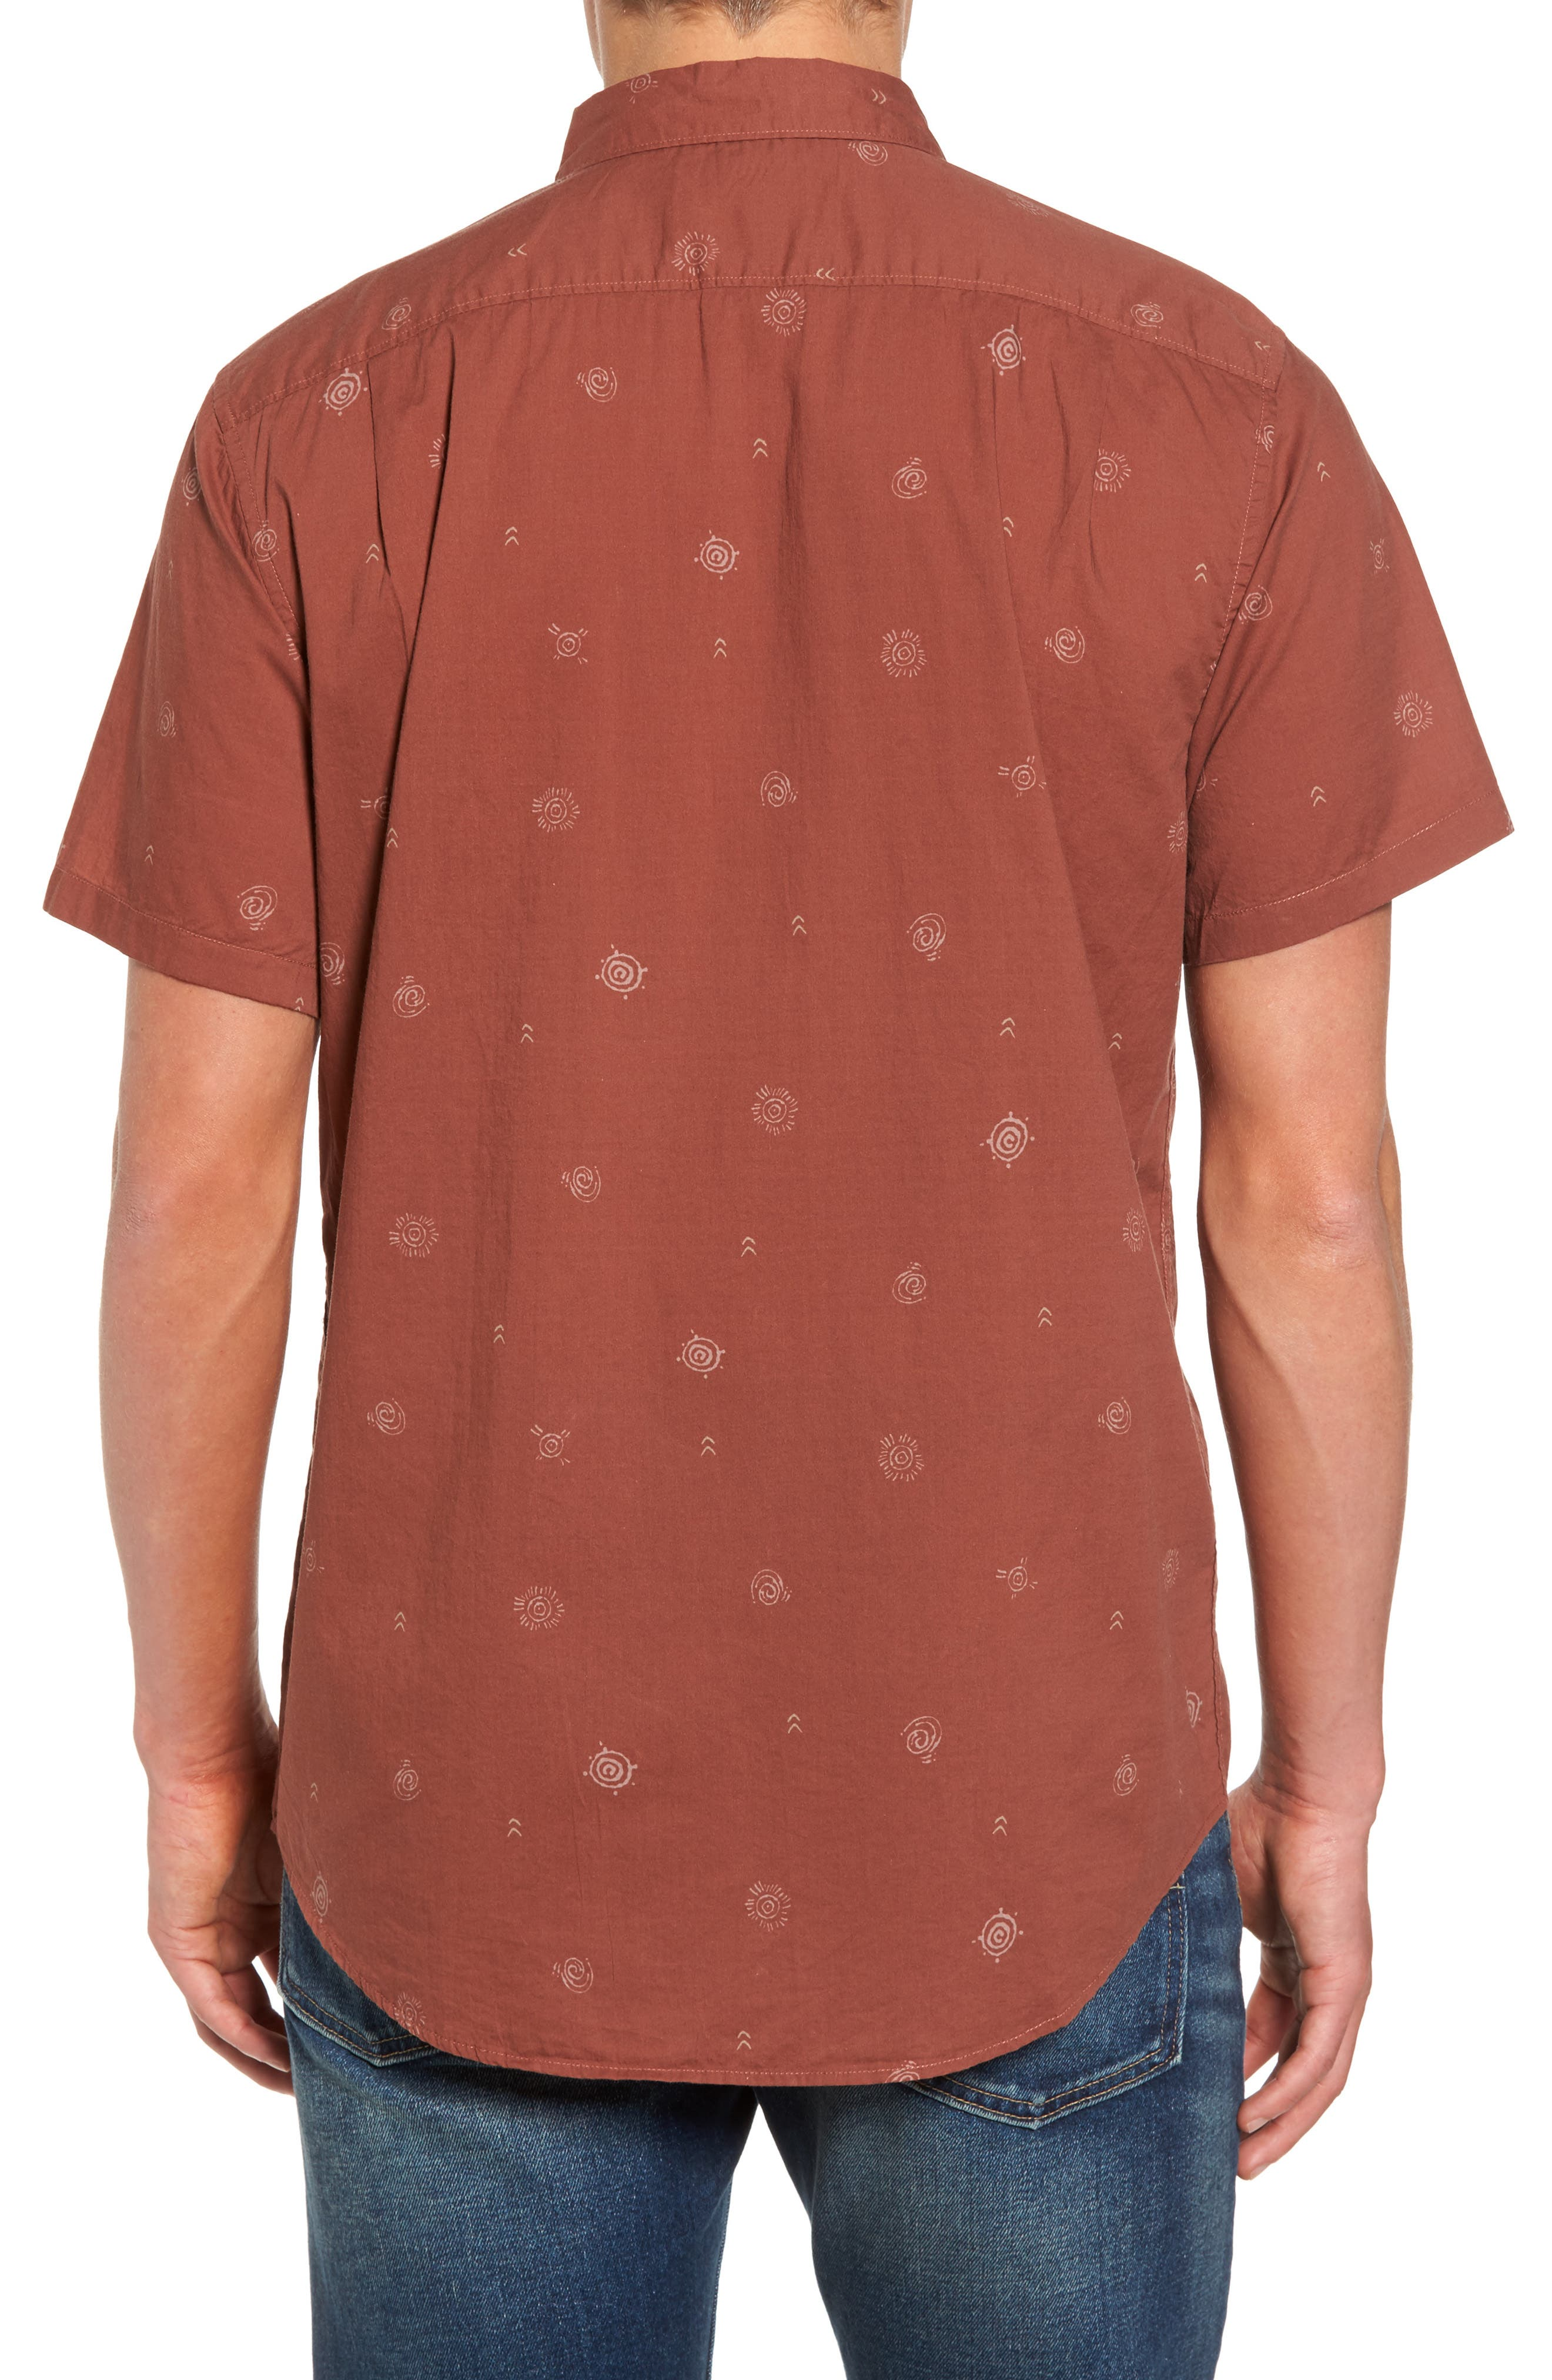 Sunday Woven Shirt,                             Alternate thumbnail 7, color,